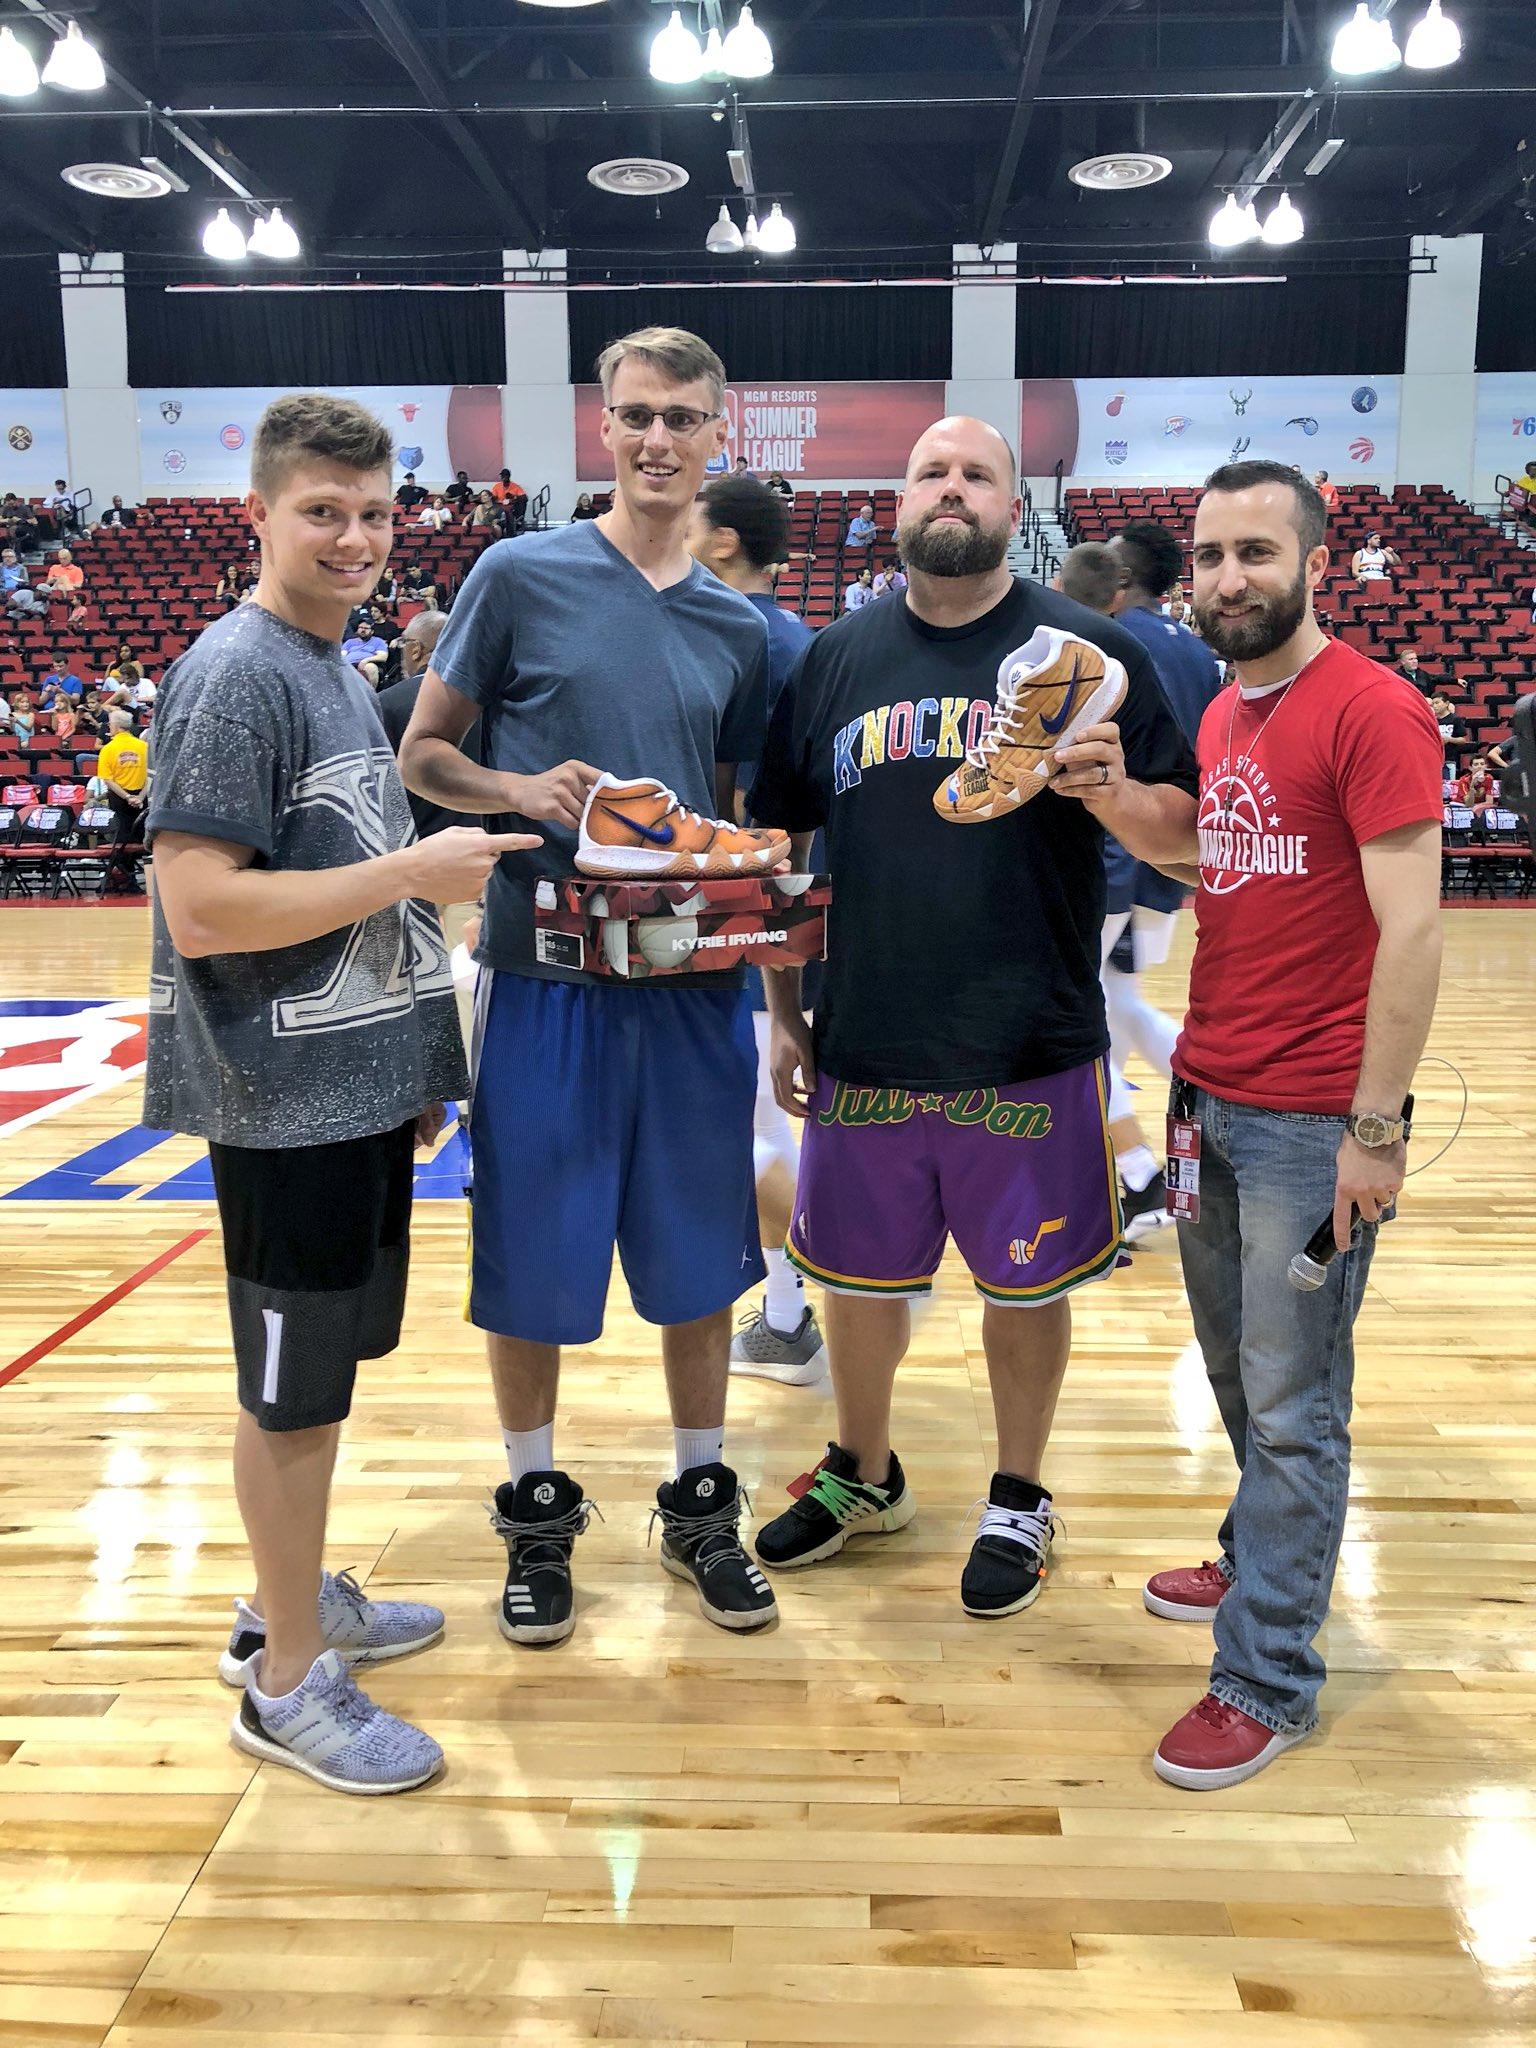 .@austinjmills presents the winner of these @MACHE275 custom #NBAKicks during halftime! #NBASummer #NBAPlaymakers https://t.co/OYpWsArUGX